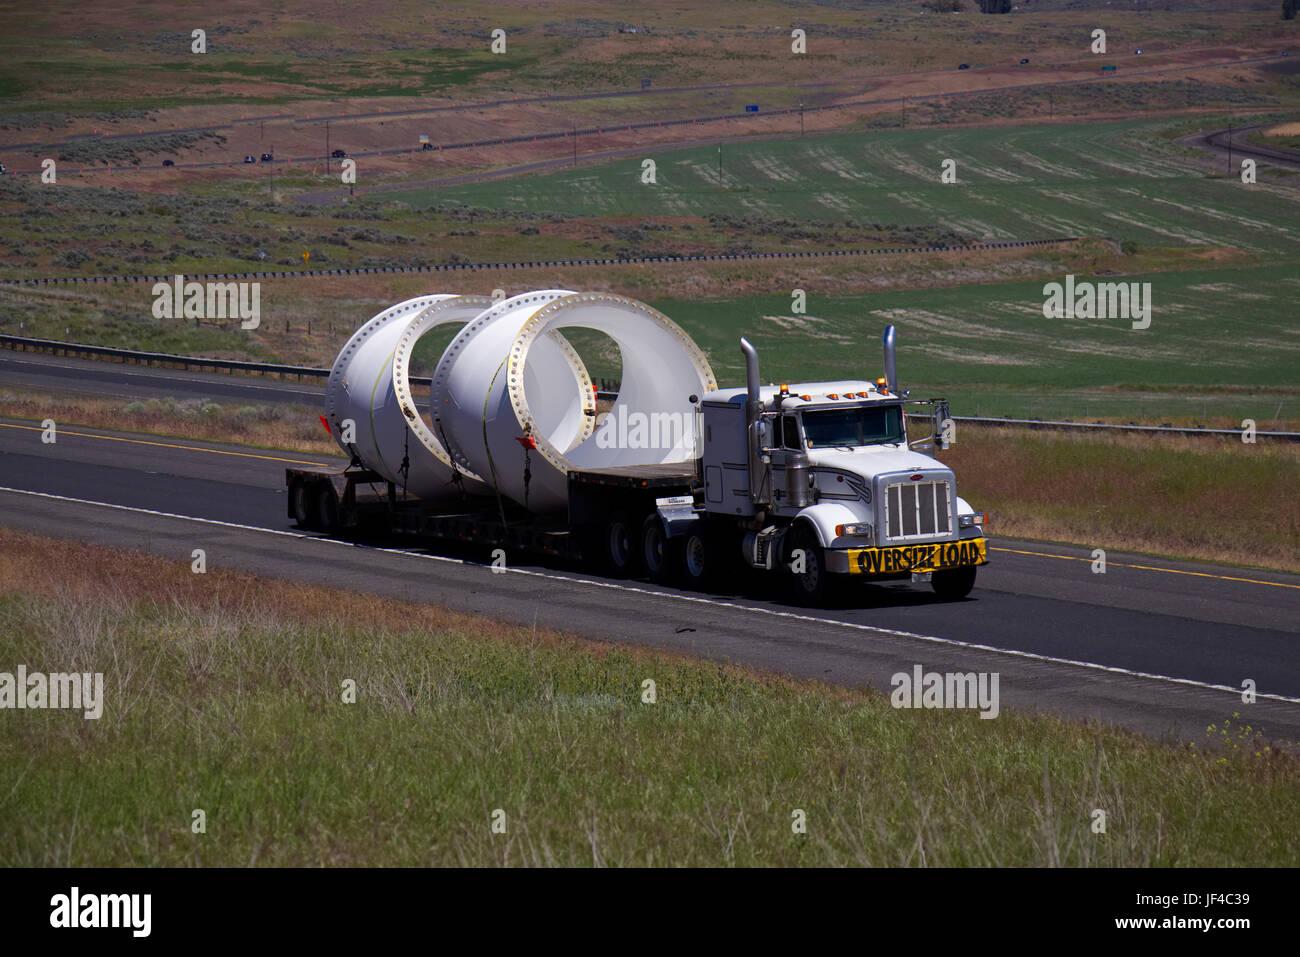 Oversize Load / White Semi-Truck - Stock Image